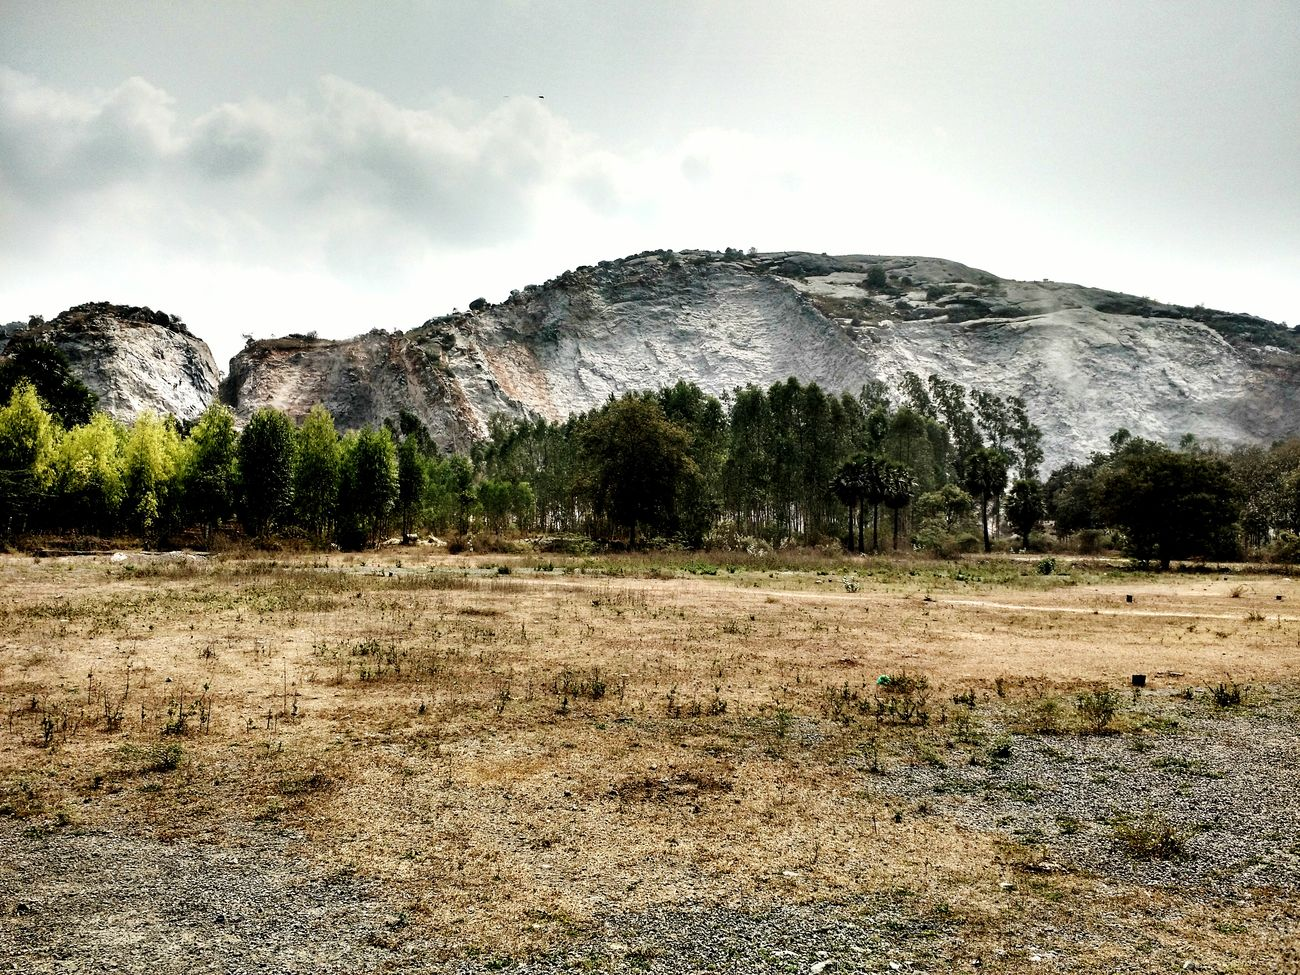 Hills Quarry Deserted Area Showcase: February